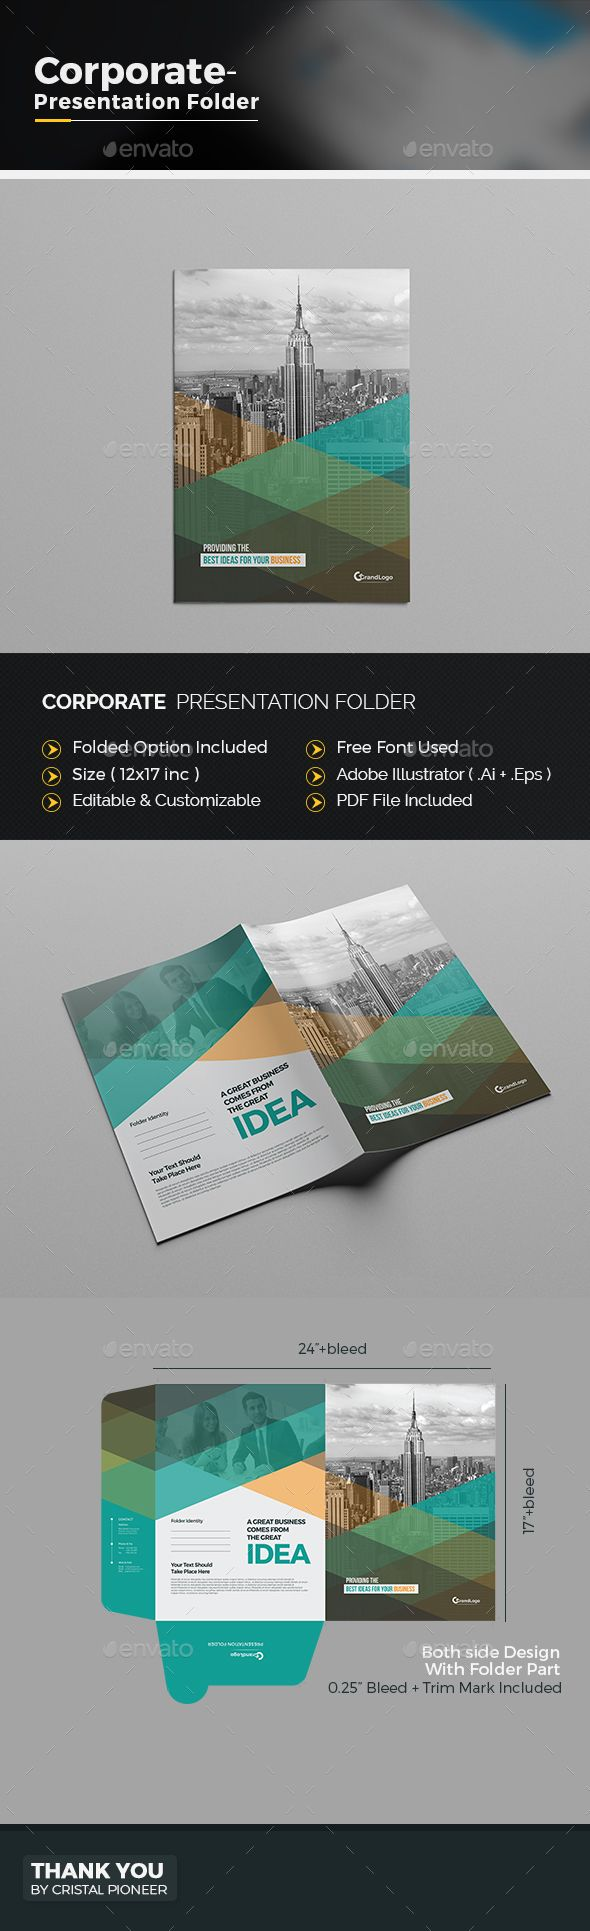 #Corporate Presentation Folder.Download here: http://graphicriver.net/item/corporate-presentation-folder/16107045?ref=arroganttype